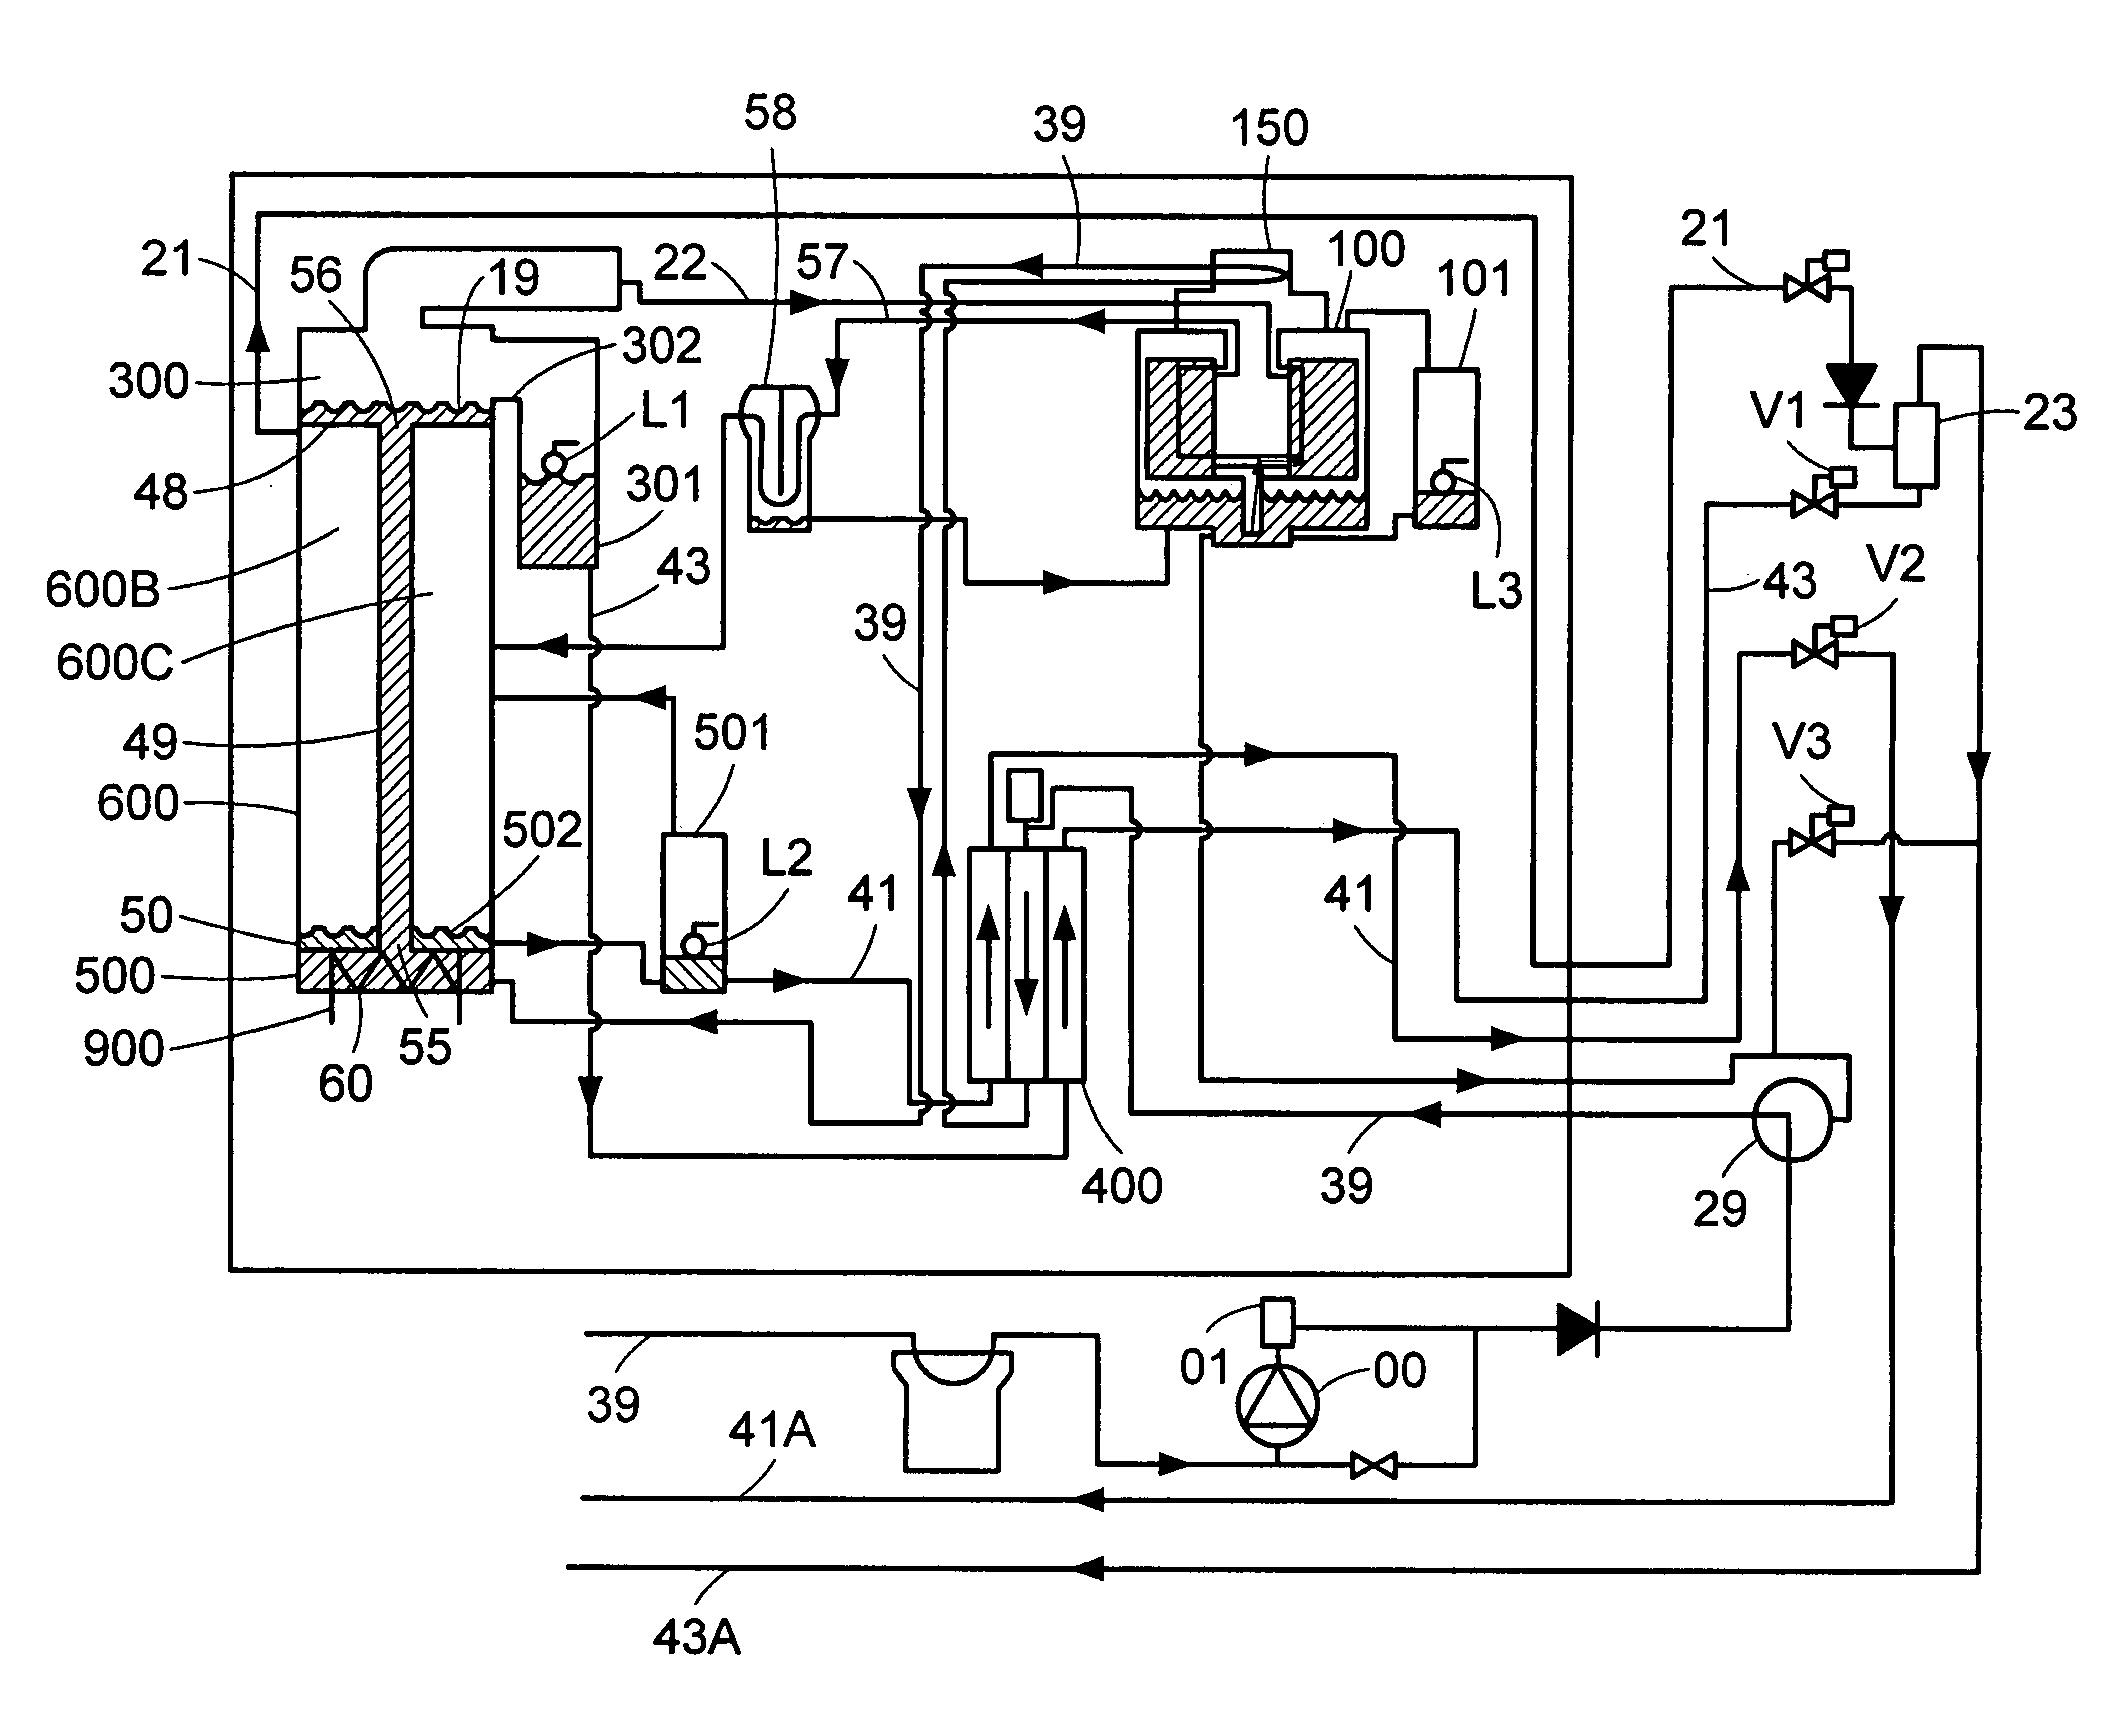 Gast Pump Wiring Diagram Electrical Vacuum Pumps 86r Compressor Schemes Schematic